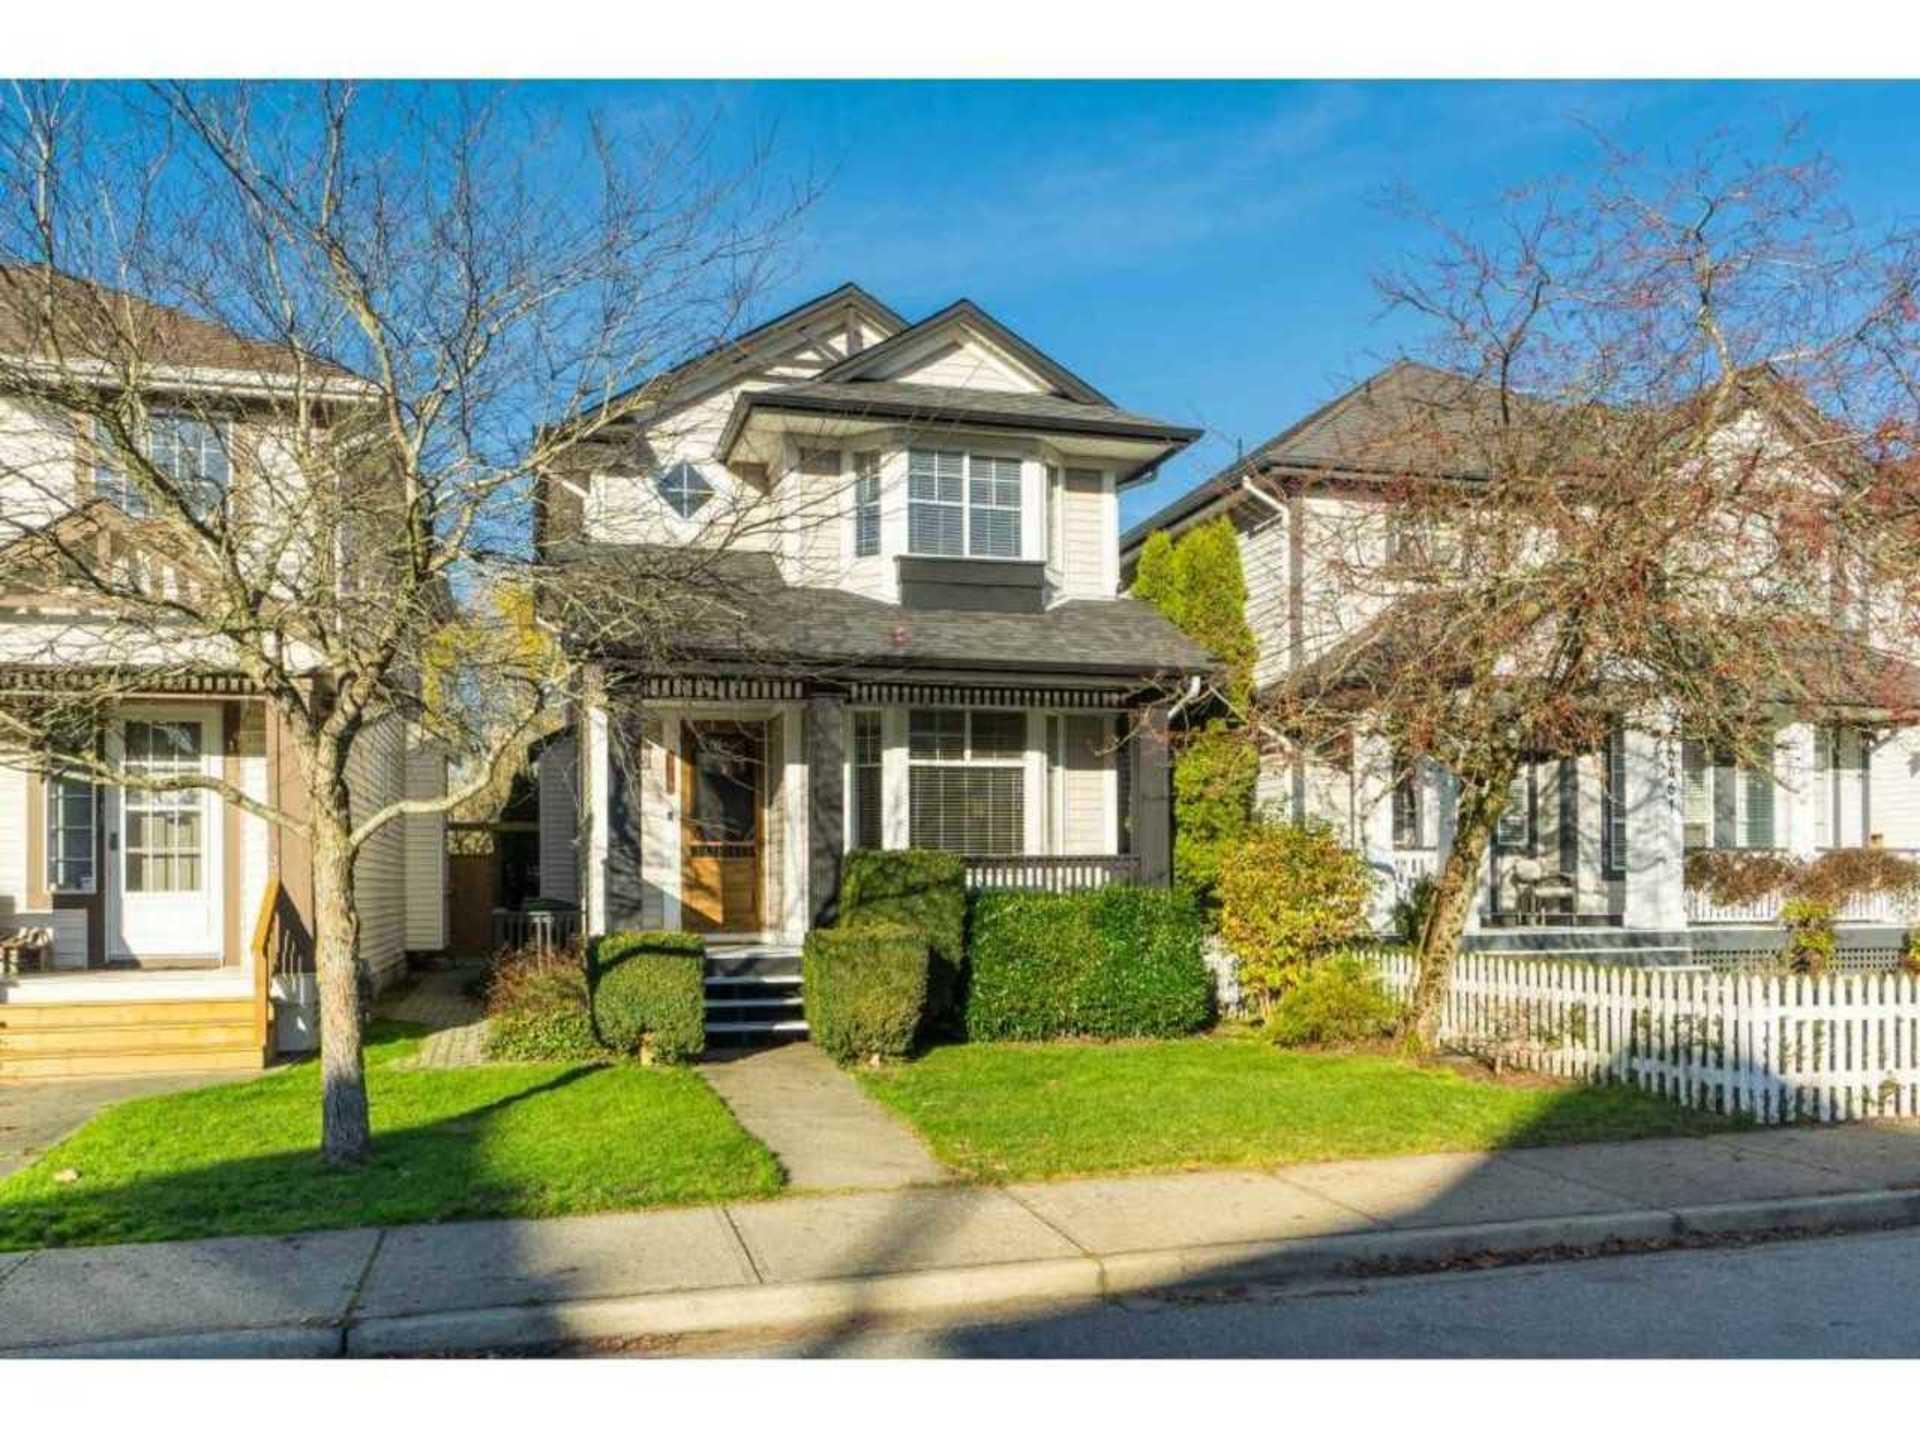 18457-65-avenue-cloverdale-bc-cloverdale-02 at 18457 65 Avenue, Cloverdale BC, Cloverdale